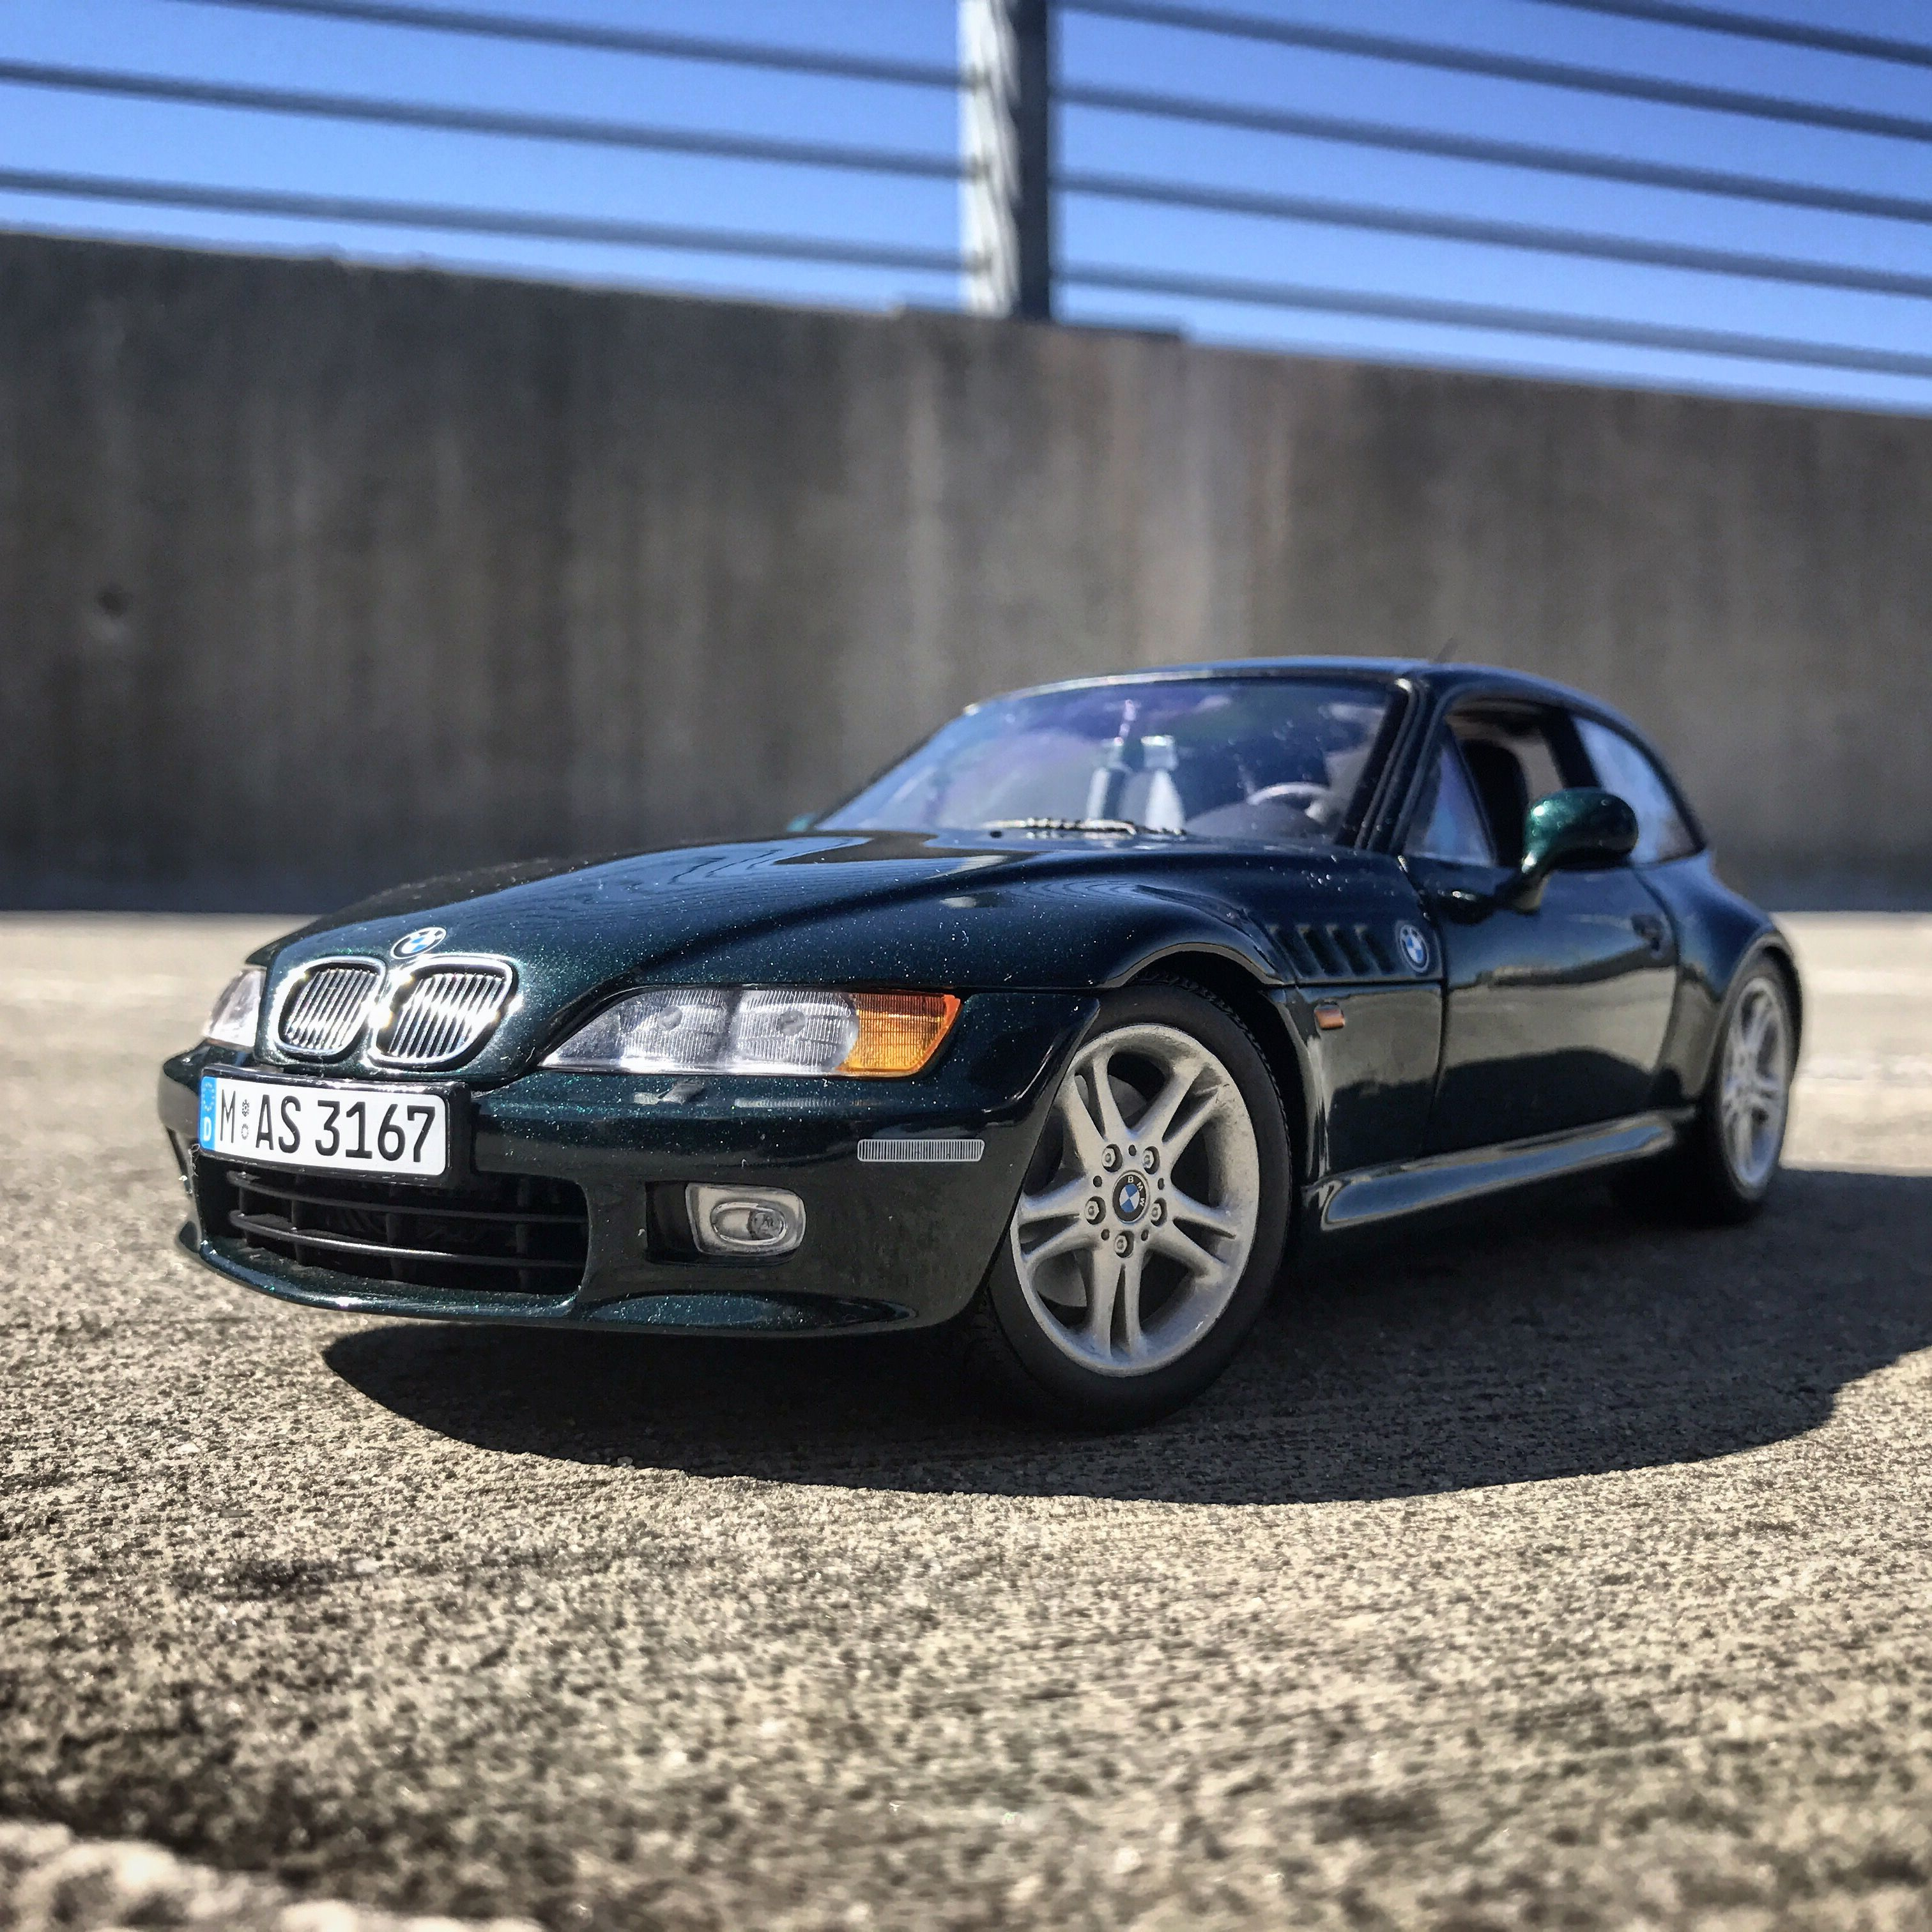 Bmw Z3: UT Models E36/8 BMW Z3 Coupe 2.8 (Dealer Edition)